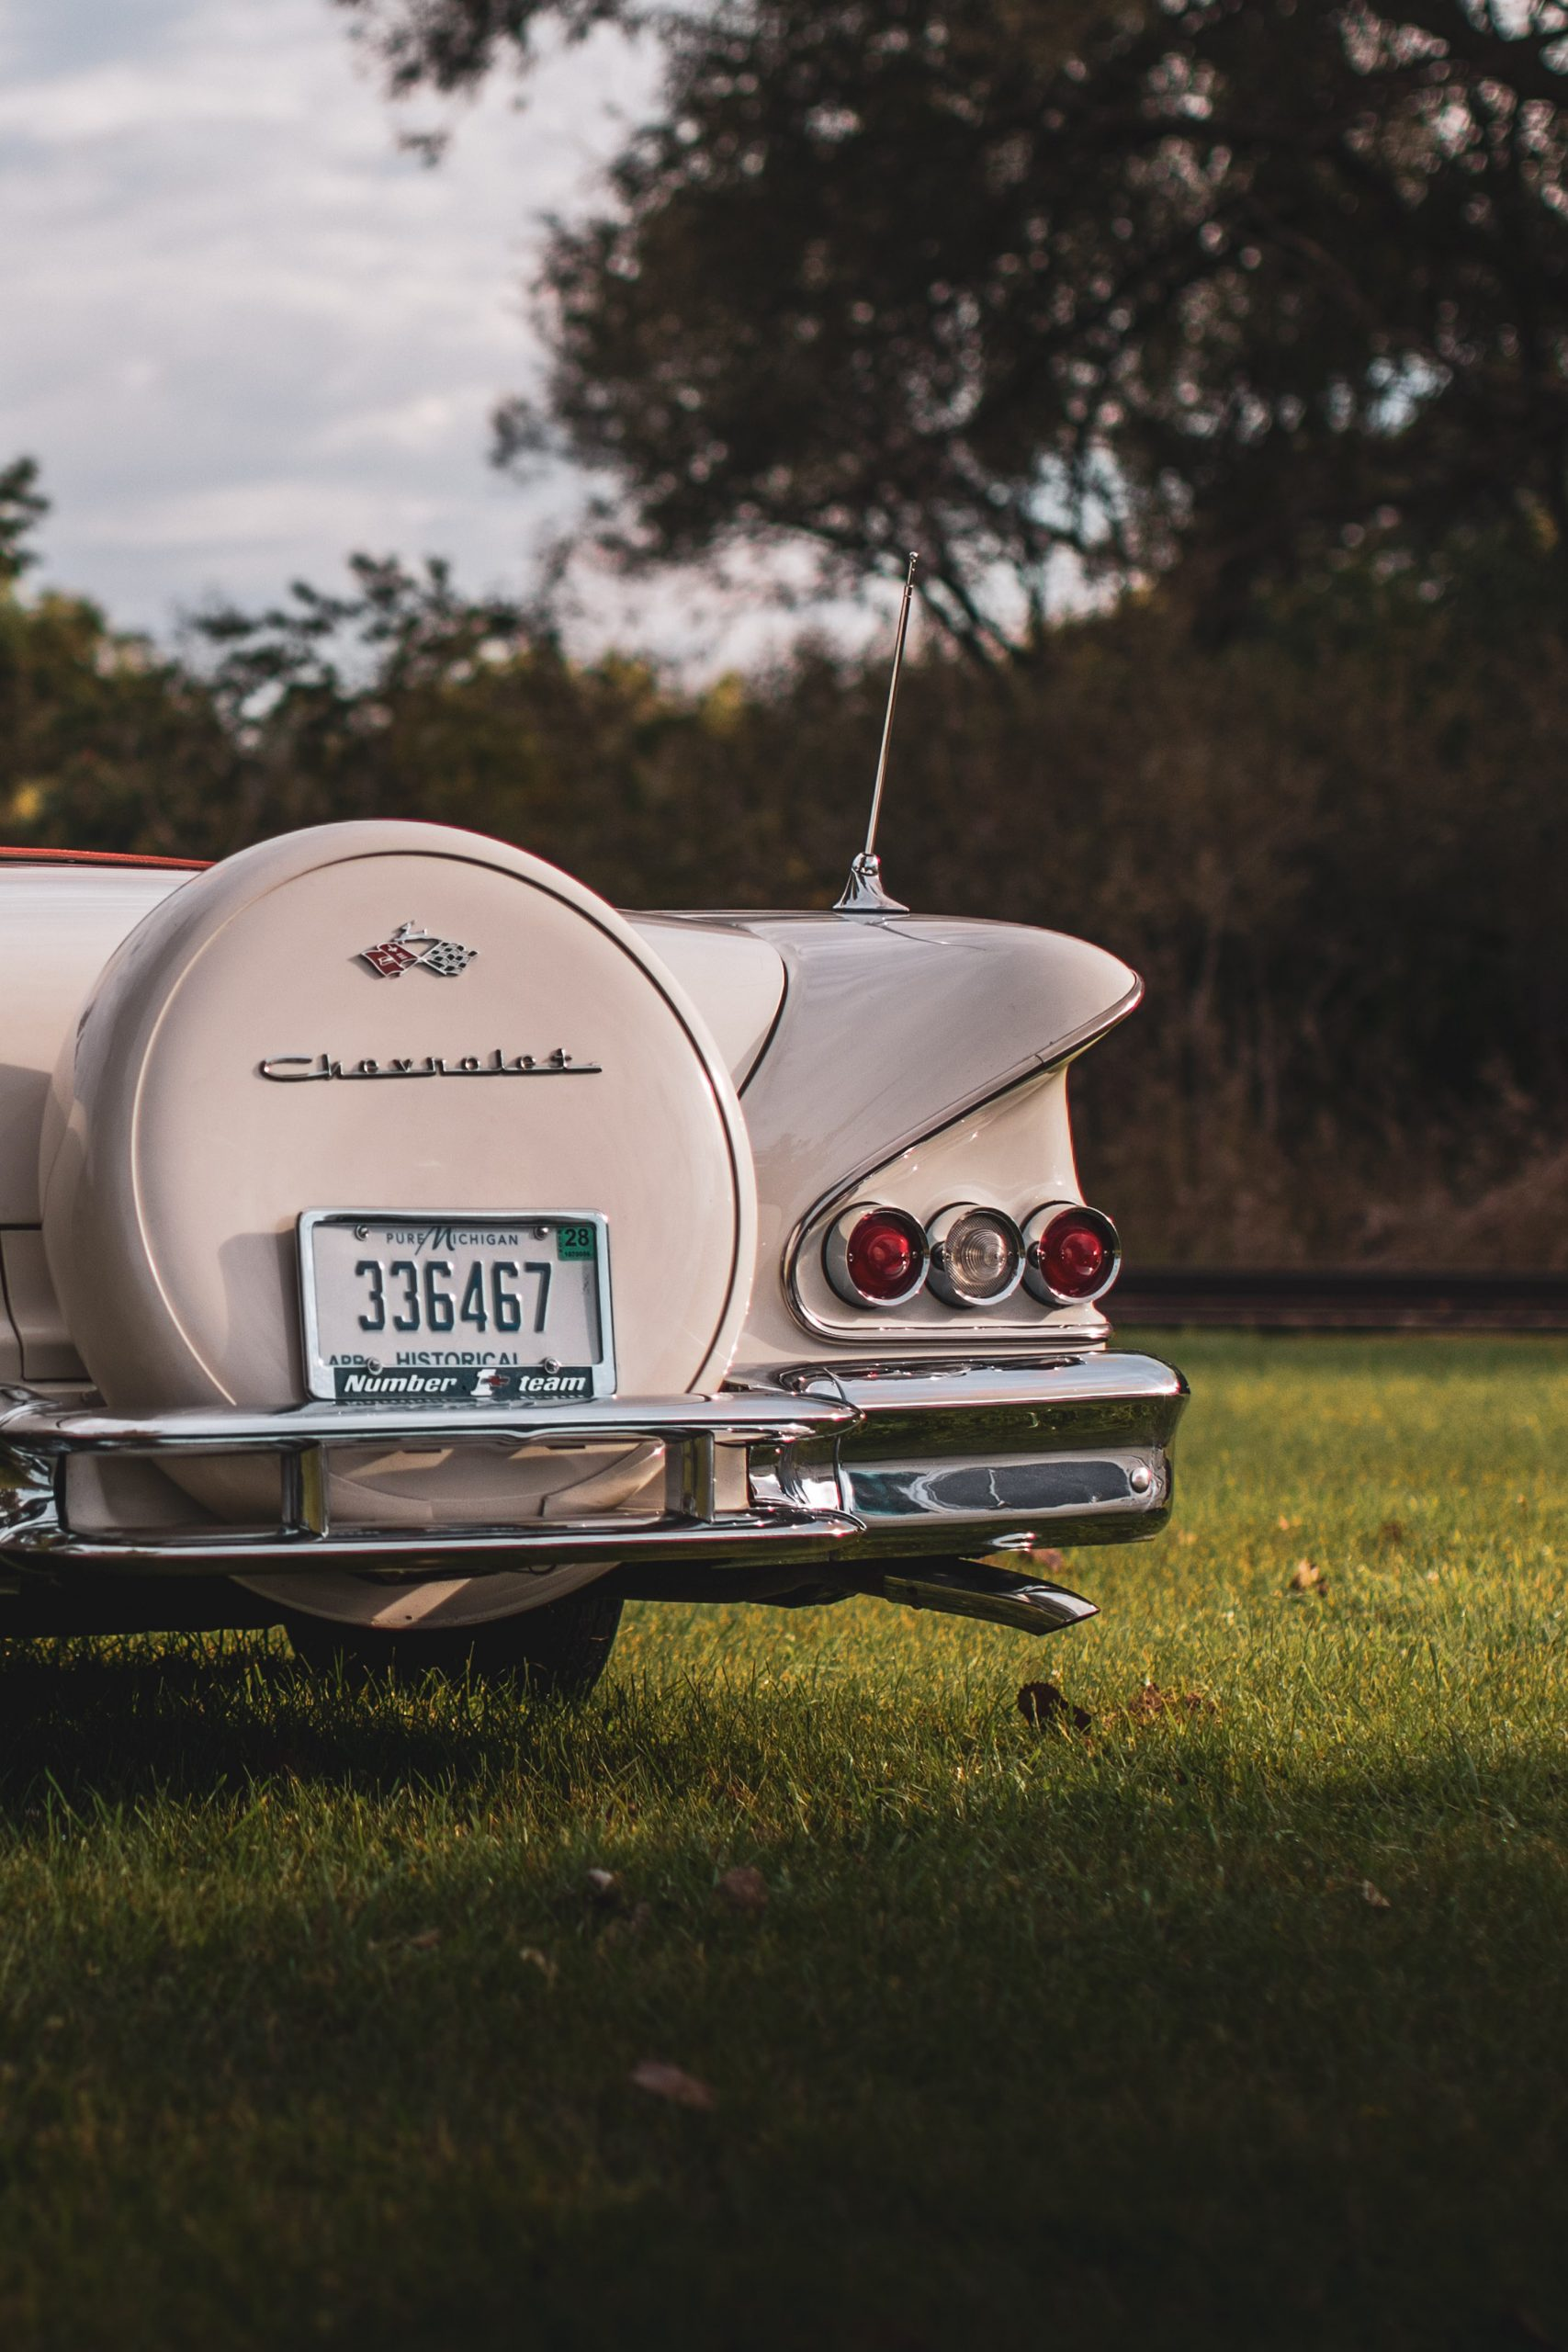 1958 Chevrolet Impala Convertible Spare Tire Cover